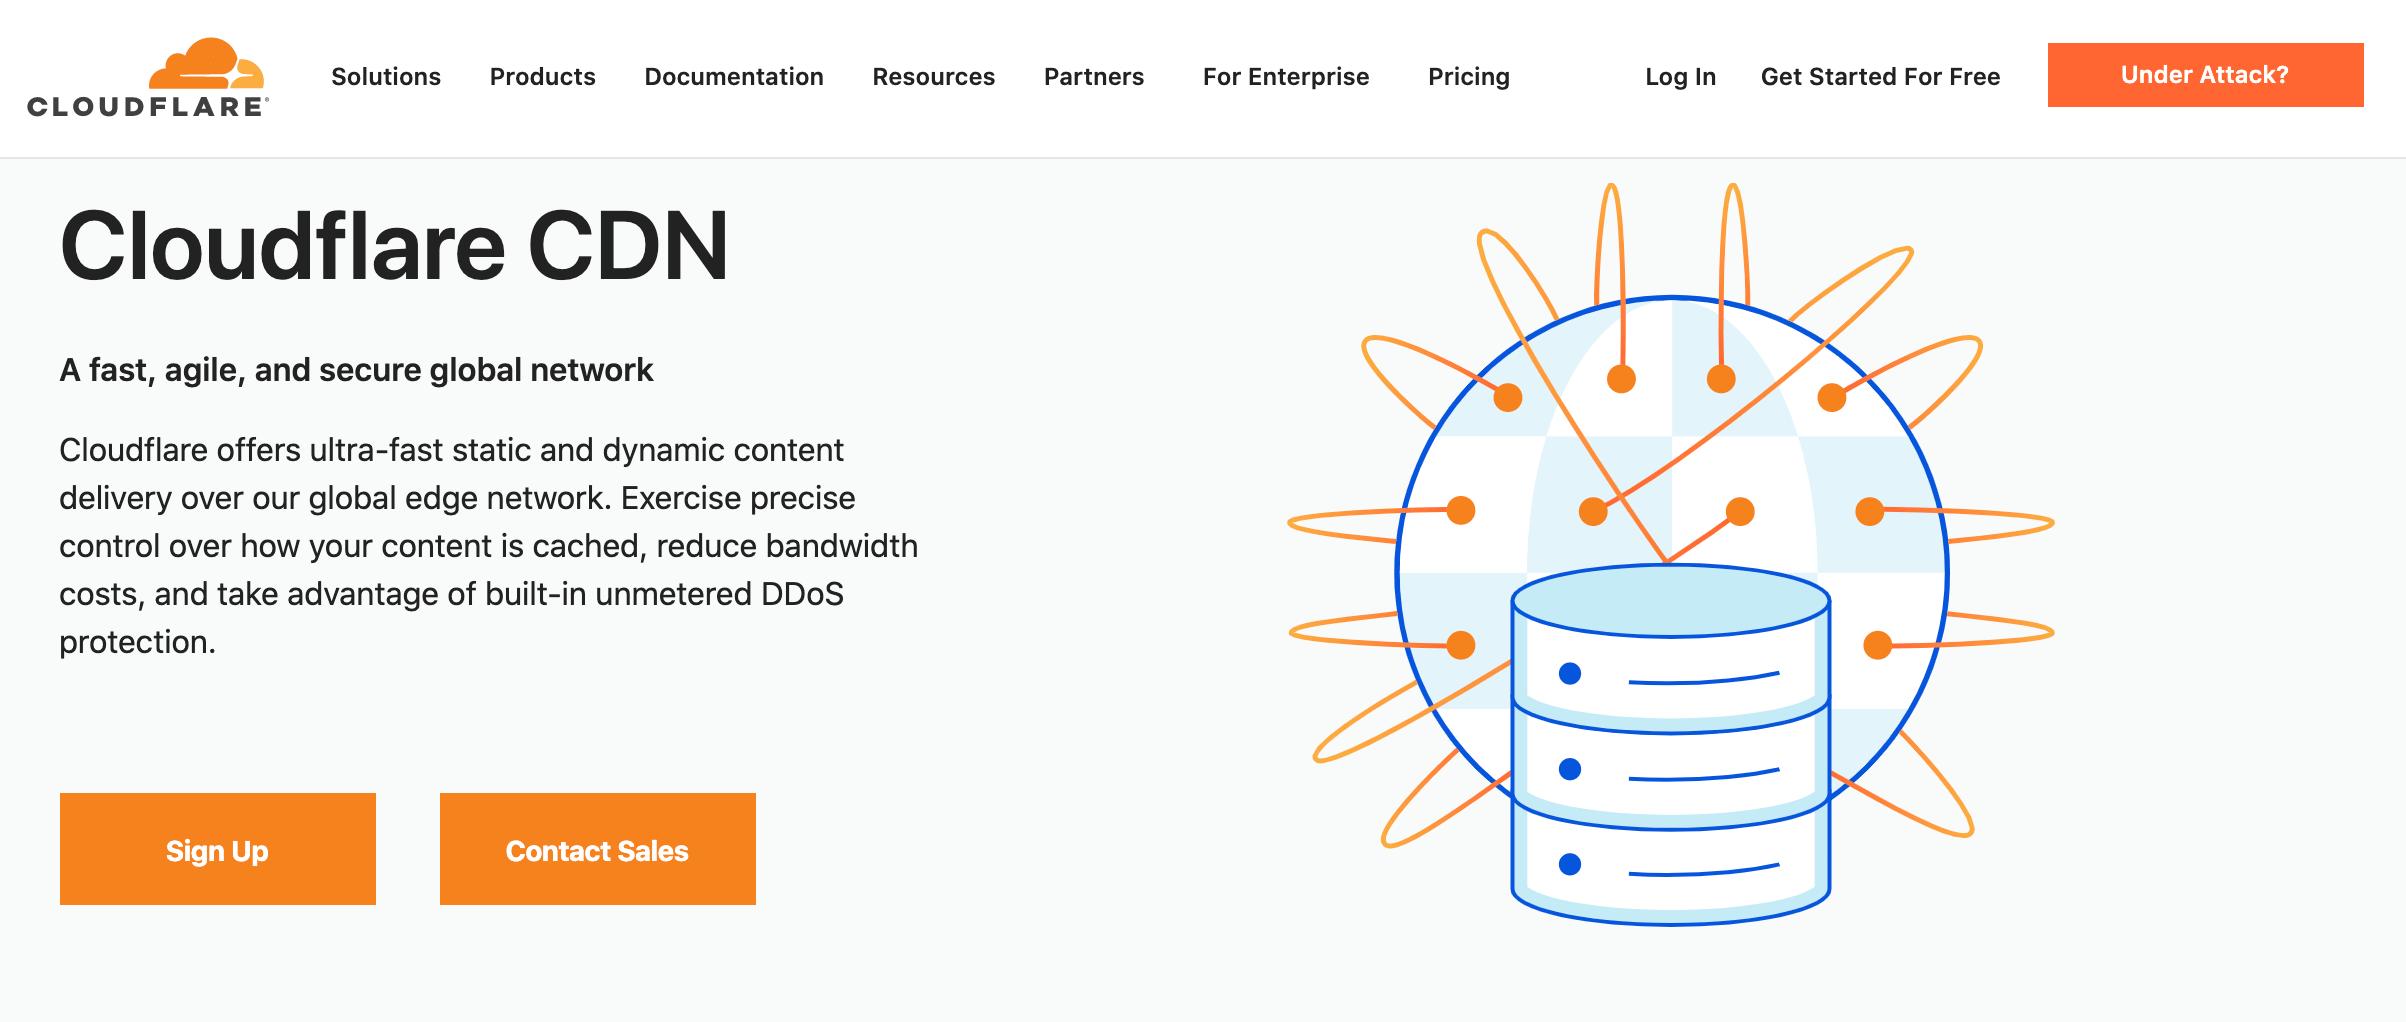 Create a secure WordPress website using a CDN.